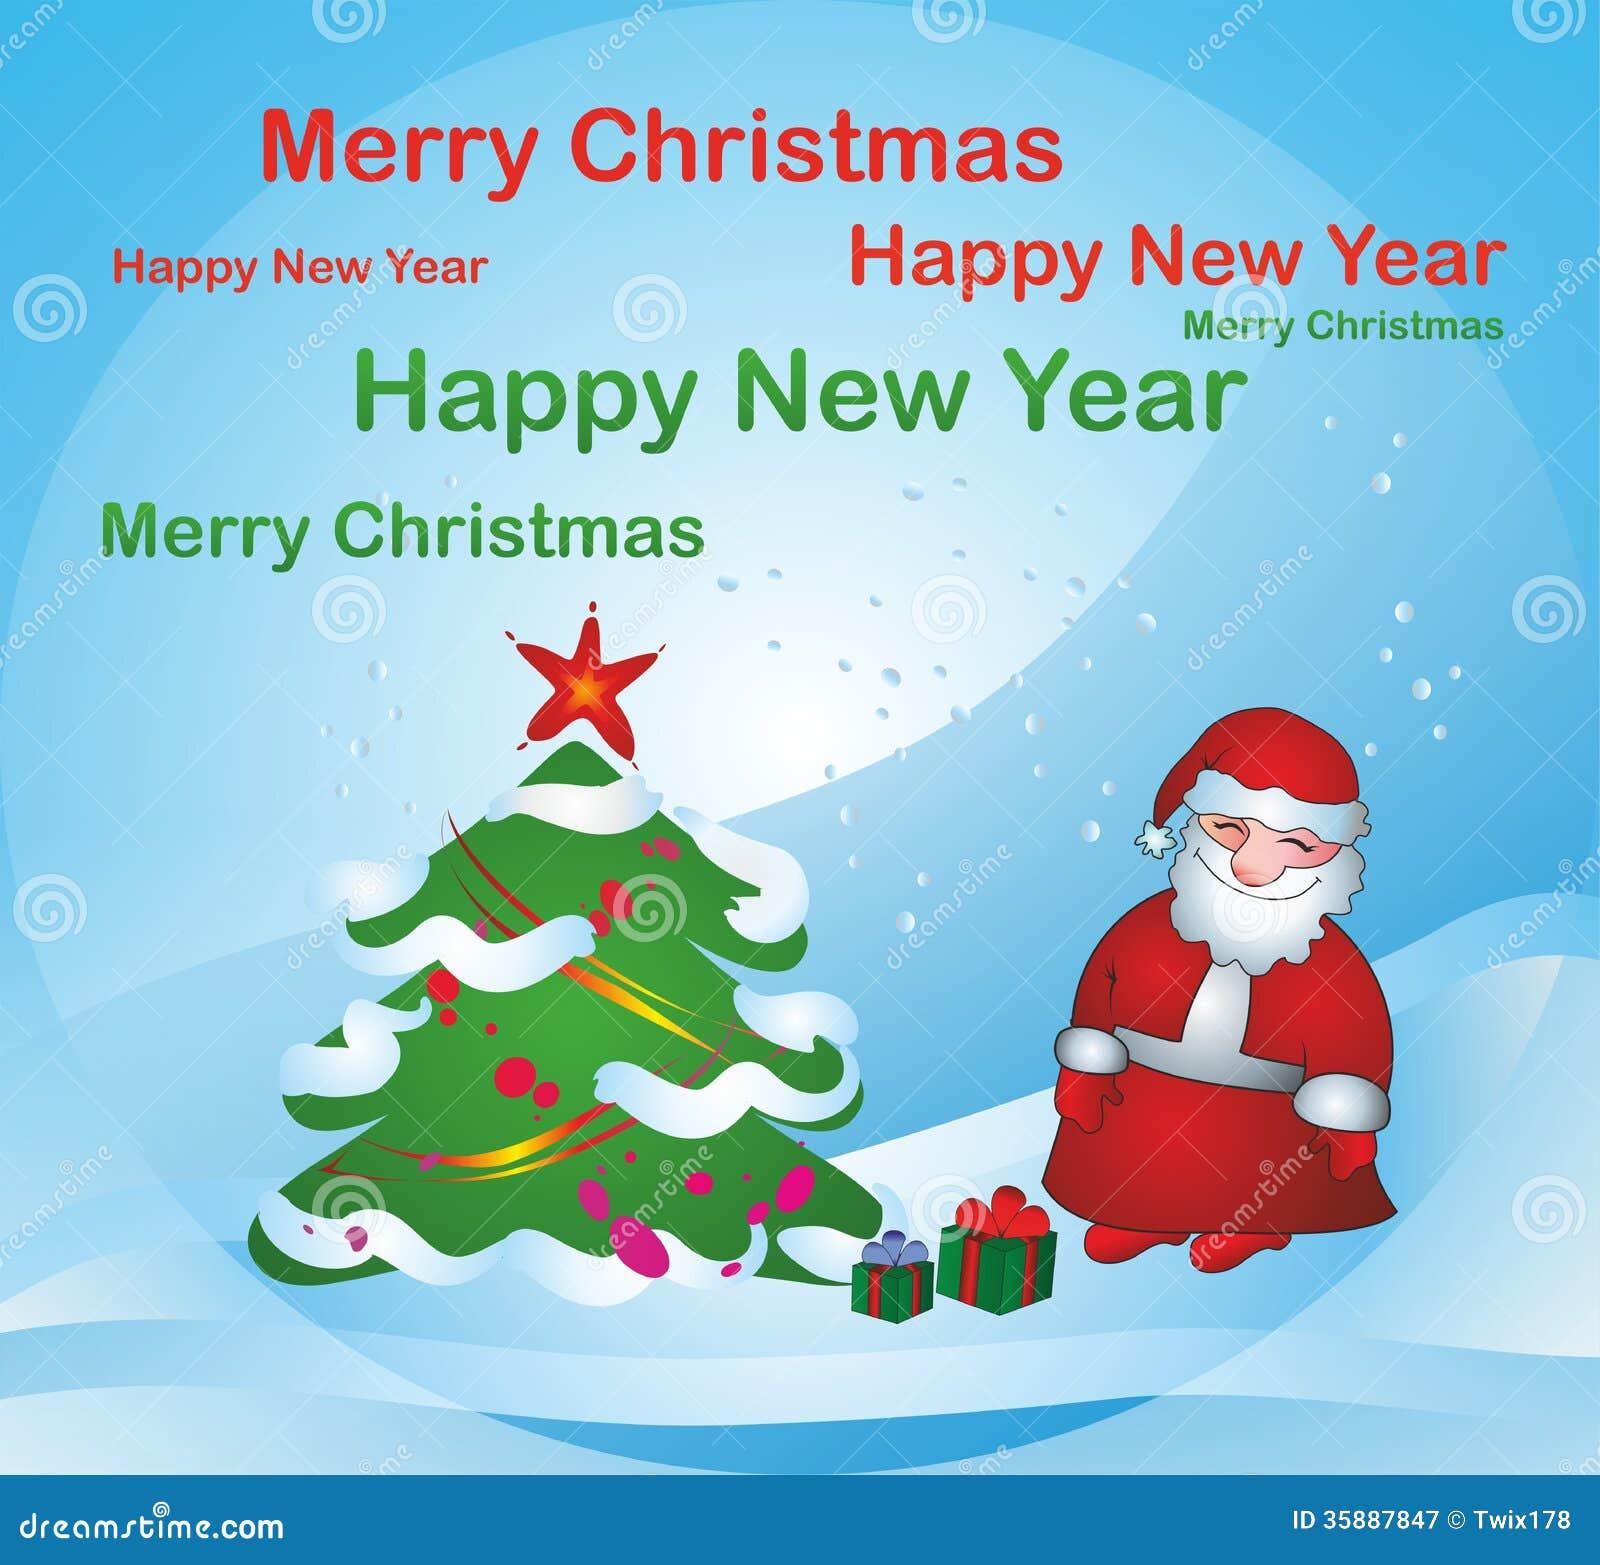 Santa Claus Near Christmas Tree Stock Vector Illustration Of Ball